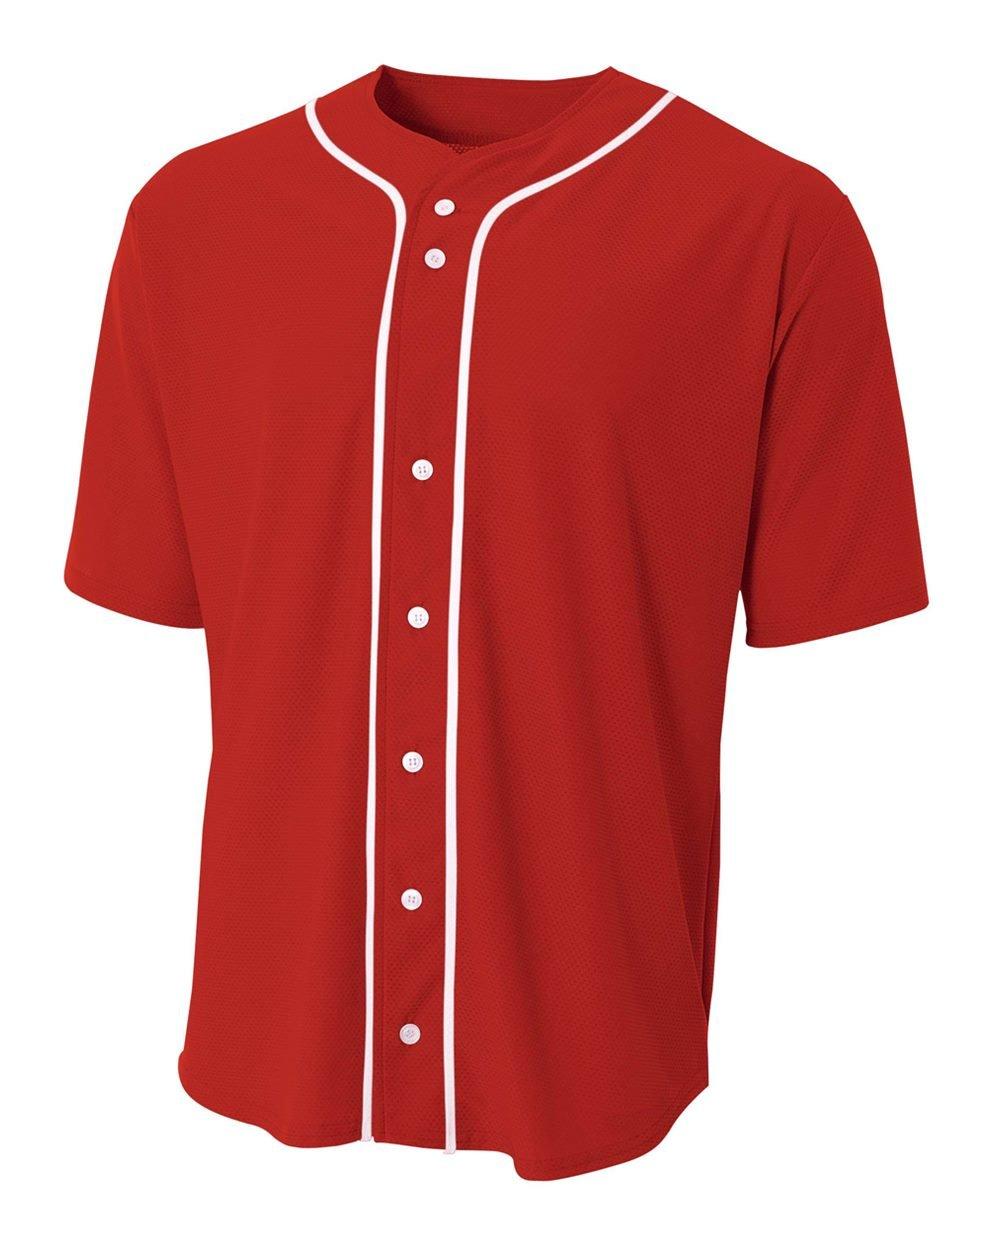 A4 Sportswear Red Youth Large (Blank) Full-Button Baseball Wicking Jersey by A4 Sportswear